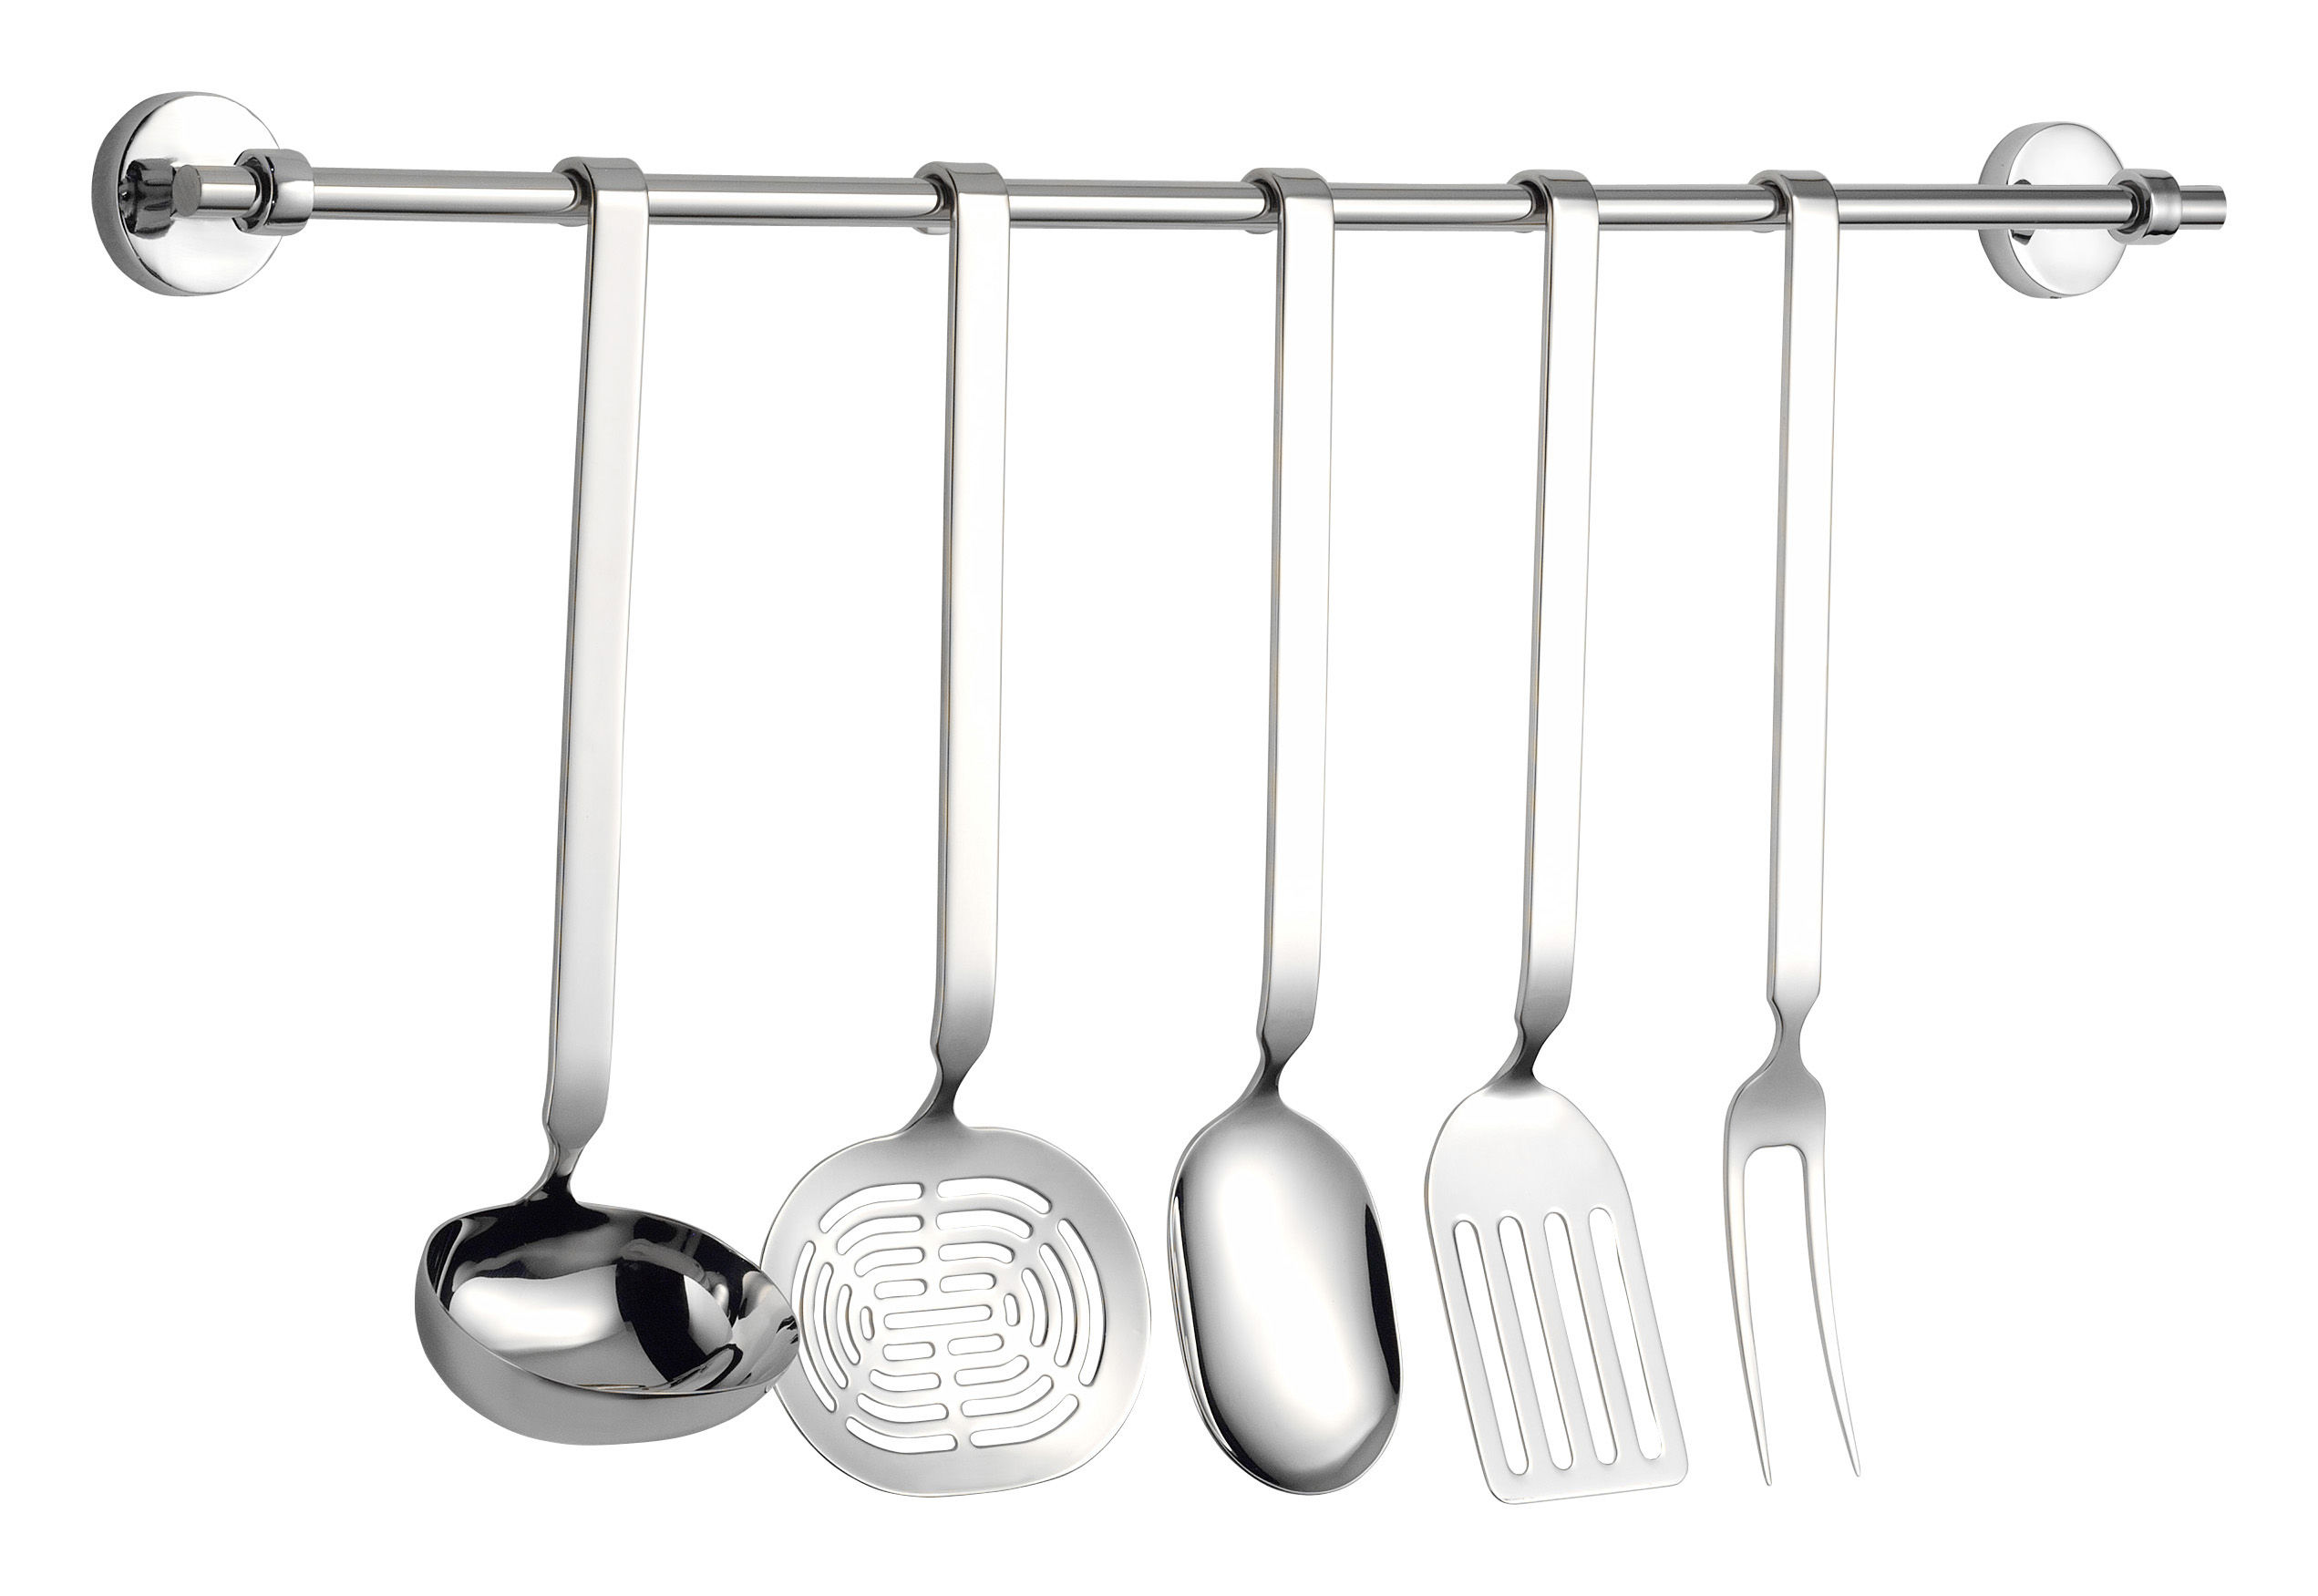 Cuisine - Ustensiles de cuisines - Set ustensiles de cuisine Cinque Stelle / 5 pièces - Serafino Zani - Inox brillant - Acier inoxydable poli